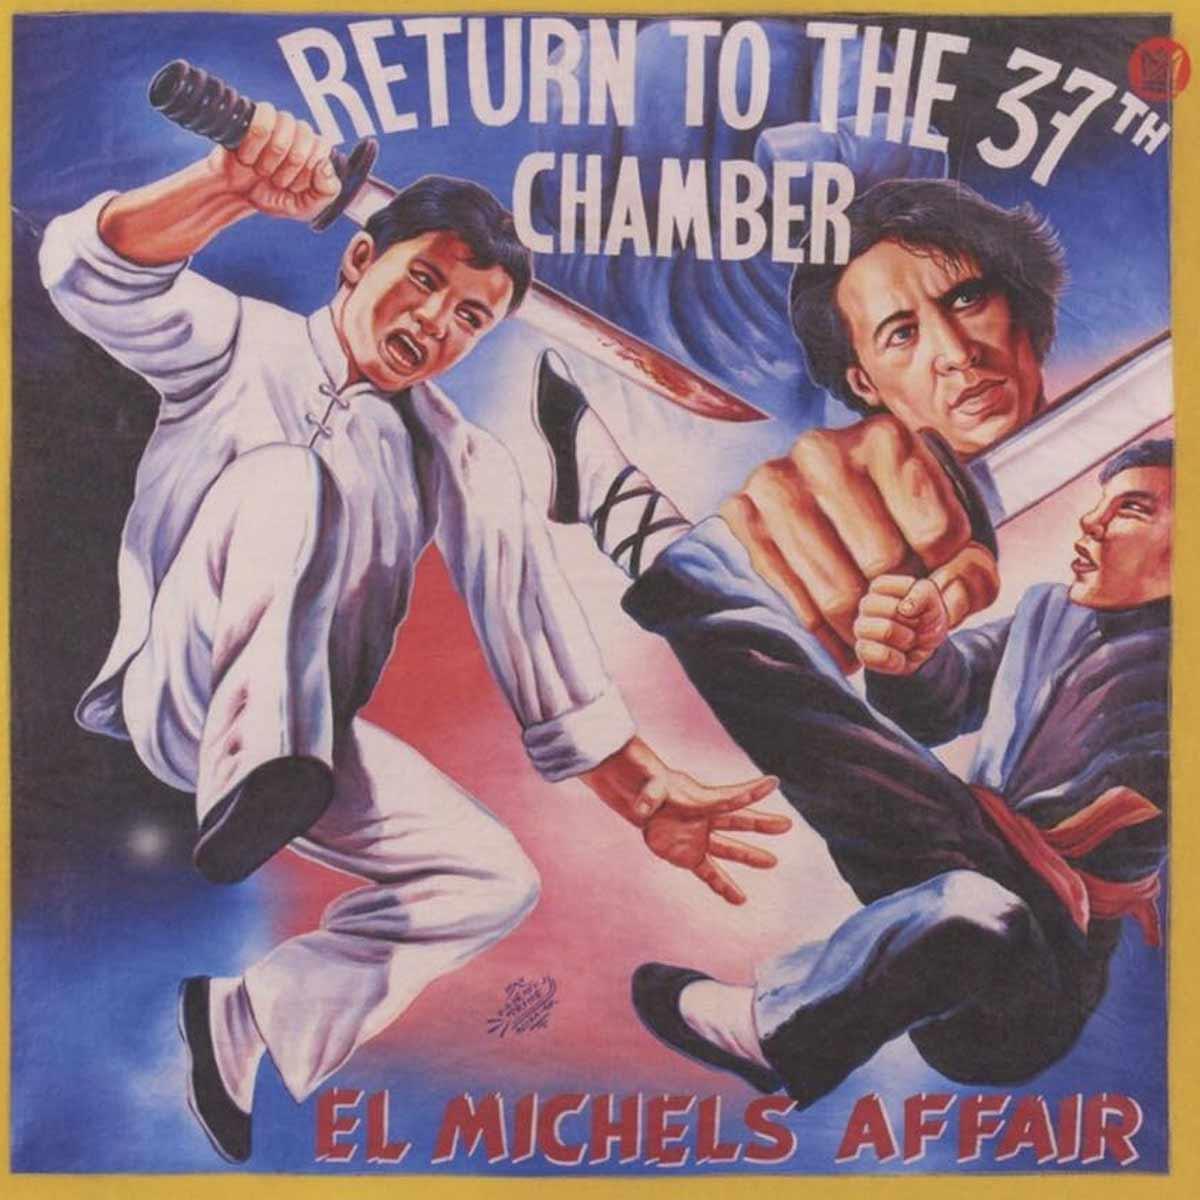 "EL MICHELS AFFAIR - Return To The 37th Chamber"""